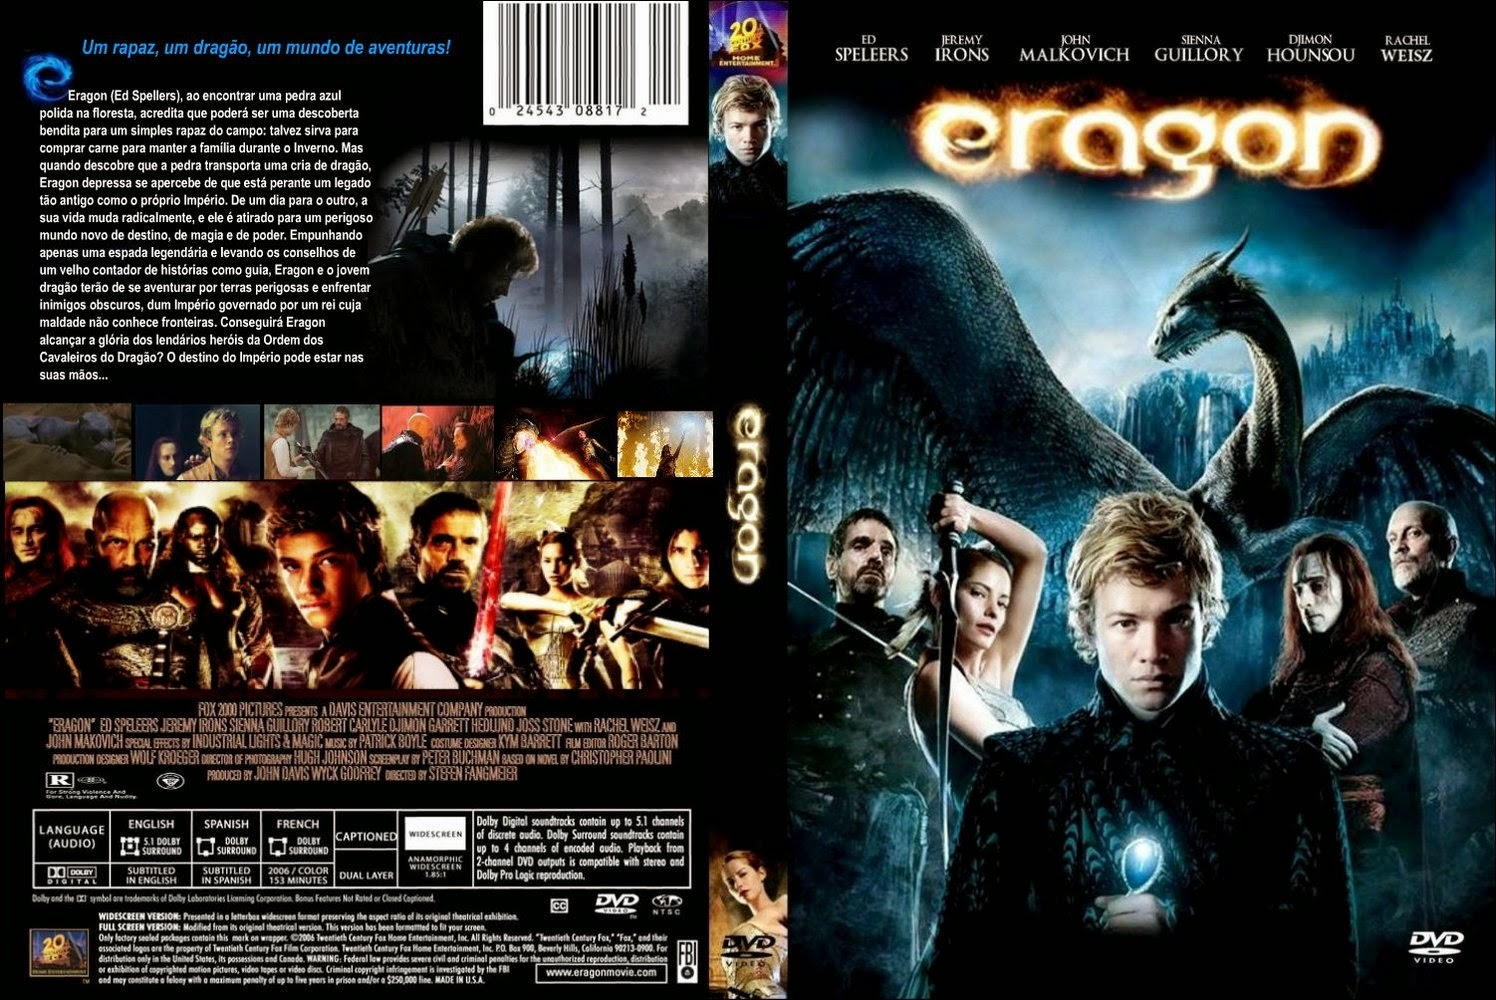 eragon full movie in hindi 720p